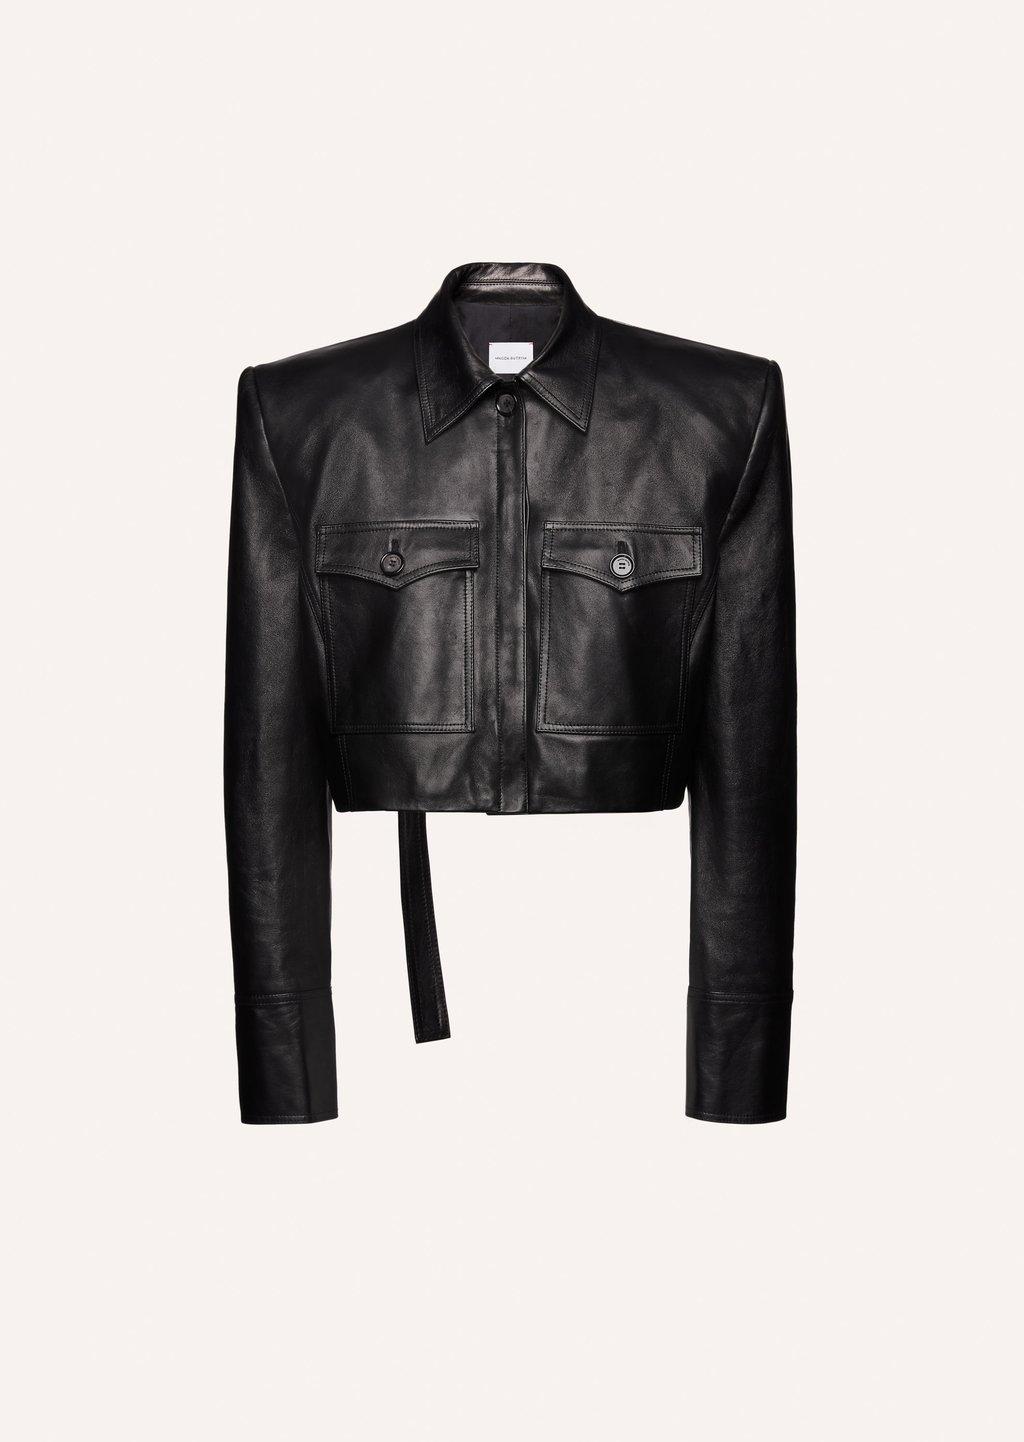 Sharp shoulder cropped leather jacket in black by Magda Butrym, available on magdabutrym.com for EUR1860 Elsa Hosk Top Exact Product